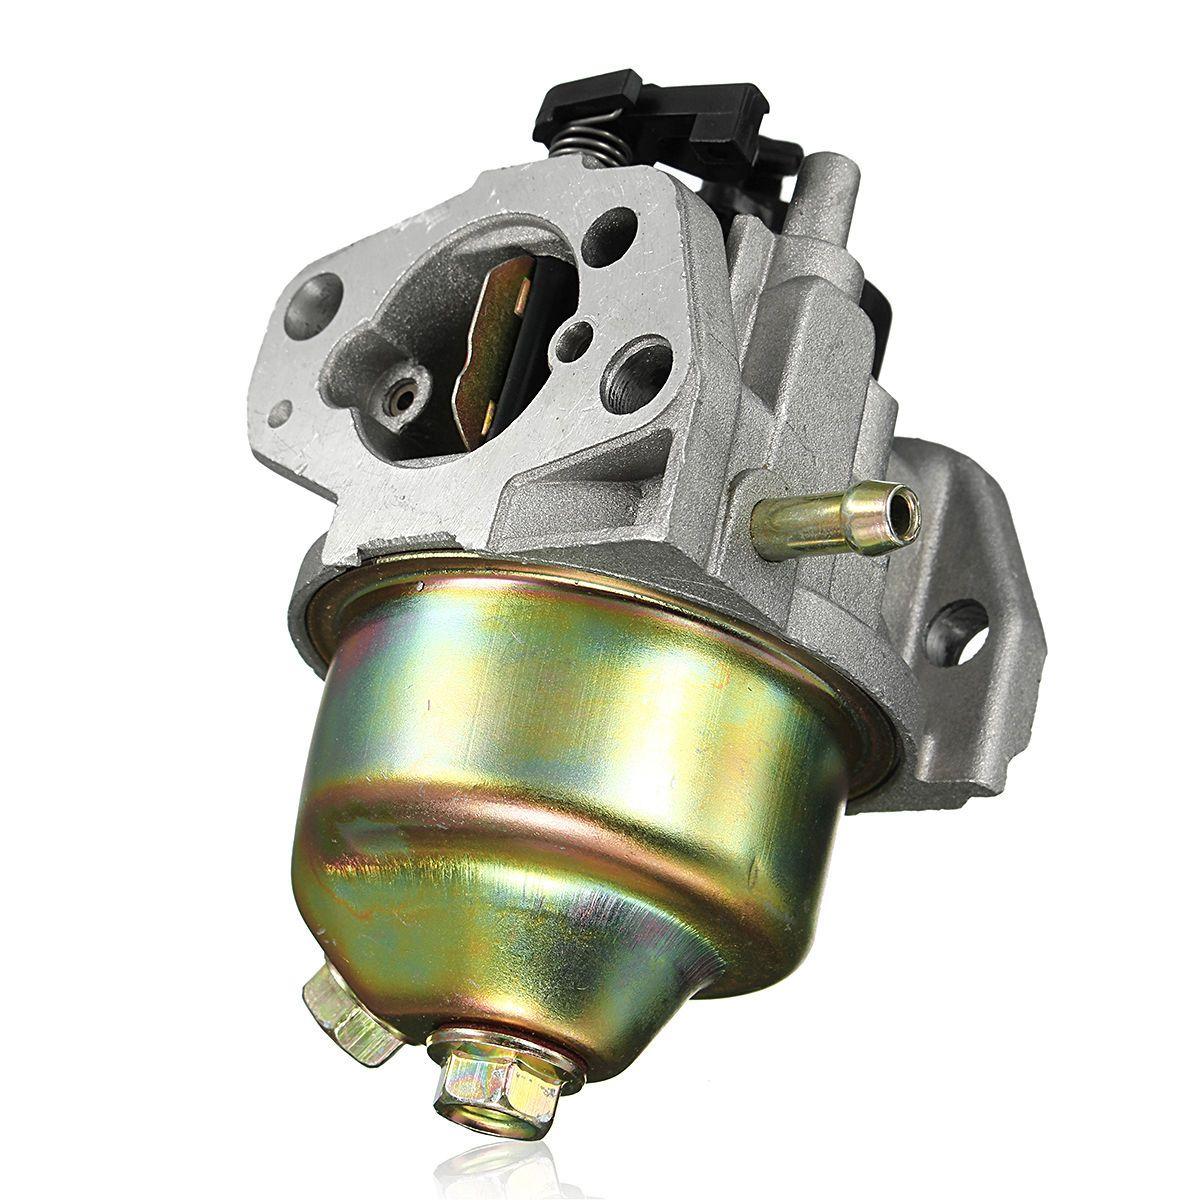 DWZ Carburetor Carb for Part No. 751-10309 & 951-10309 MTD OHV Engine Carburetor New ey28b robin carburetor carb engine part